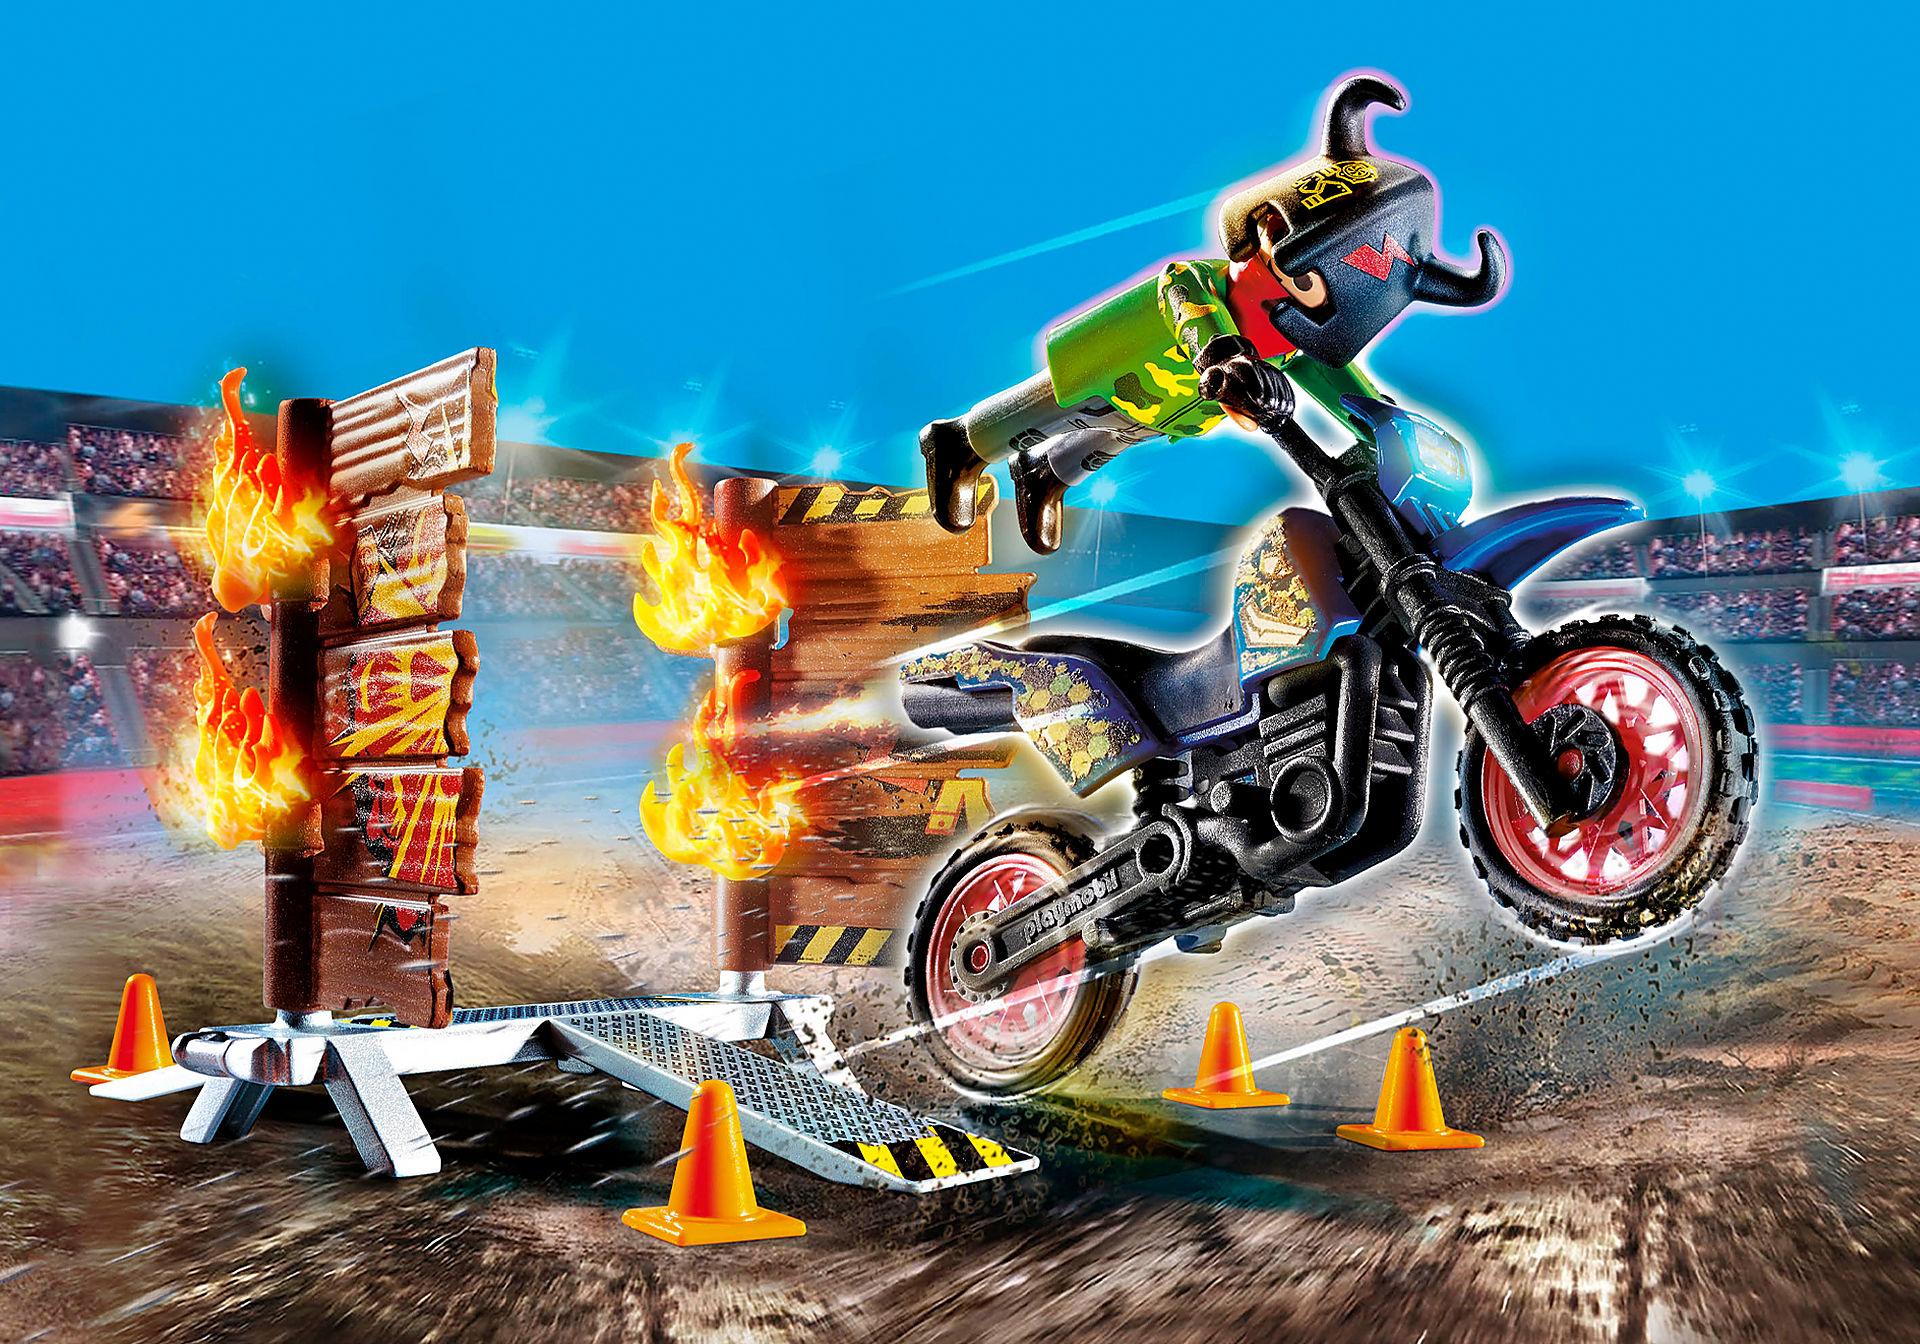 70553 Stuntshow Motorcykel med brandmur zoom image1